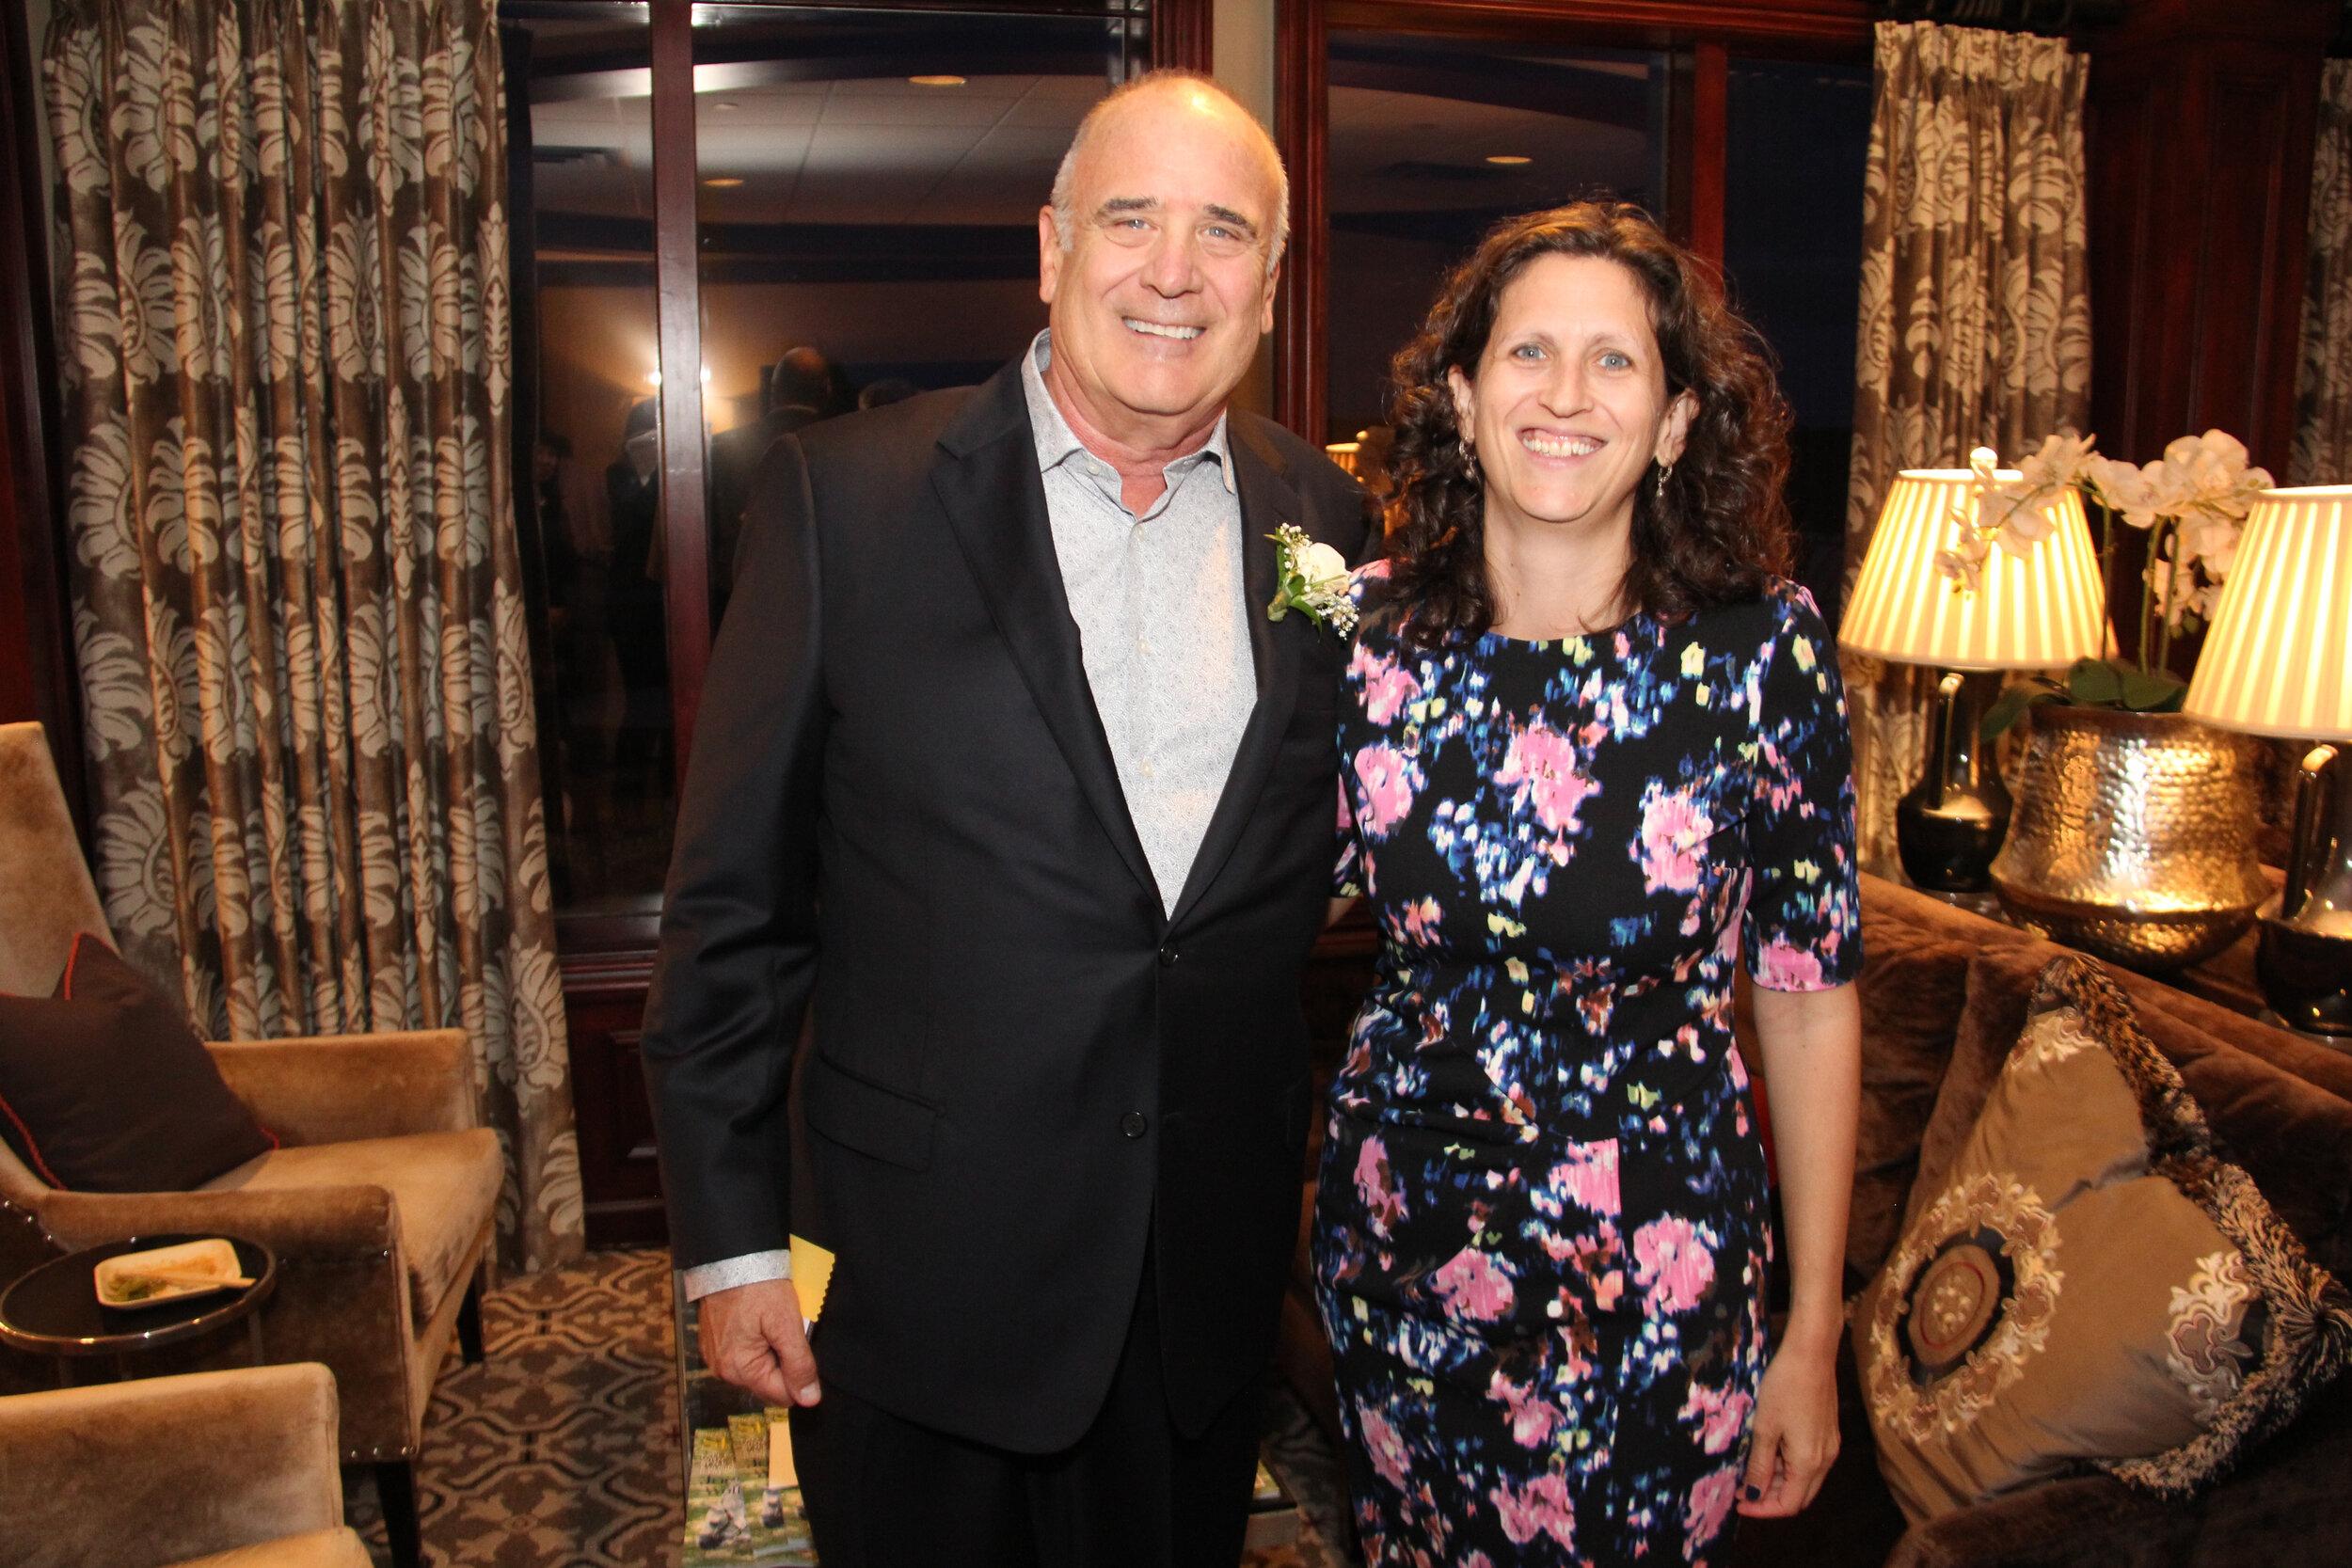 Jim Turnbull, (Honoree) Standard Ceramic Supply Company, Emily Peck Executive Director